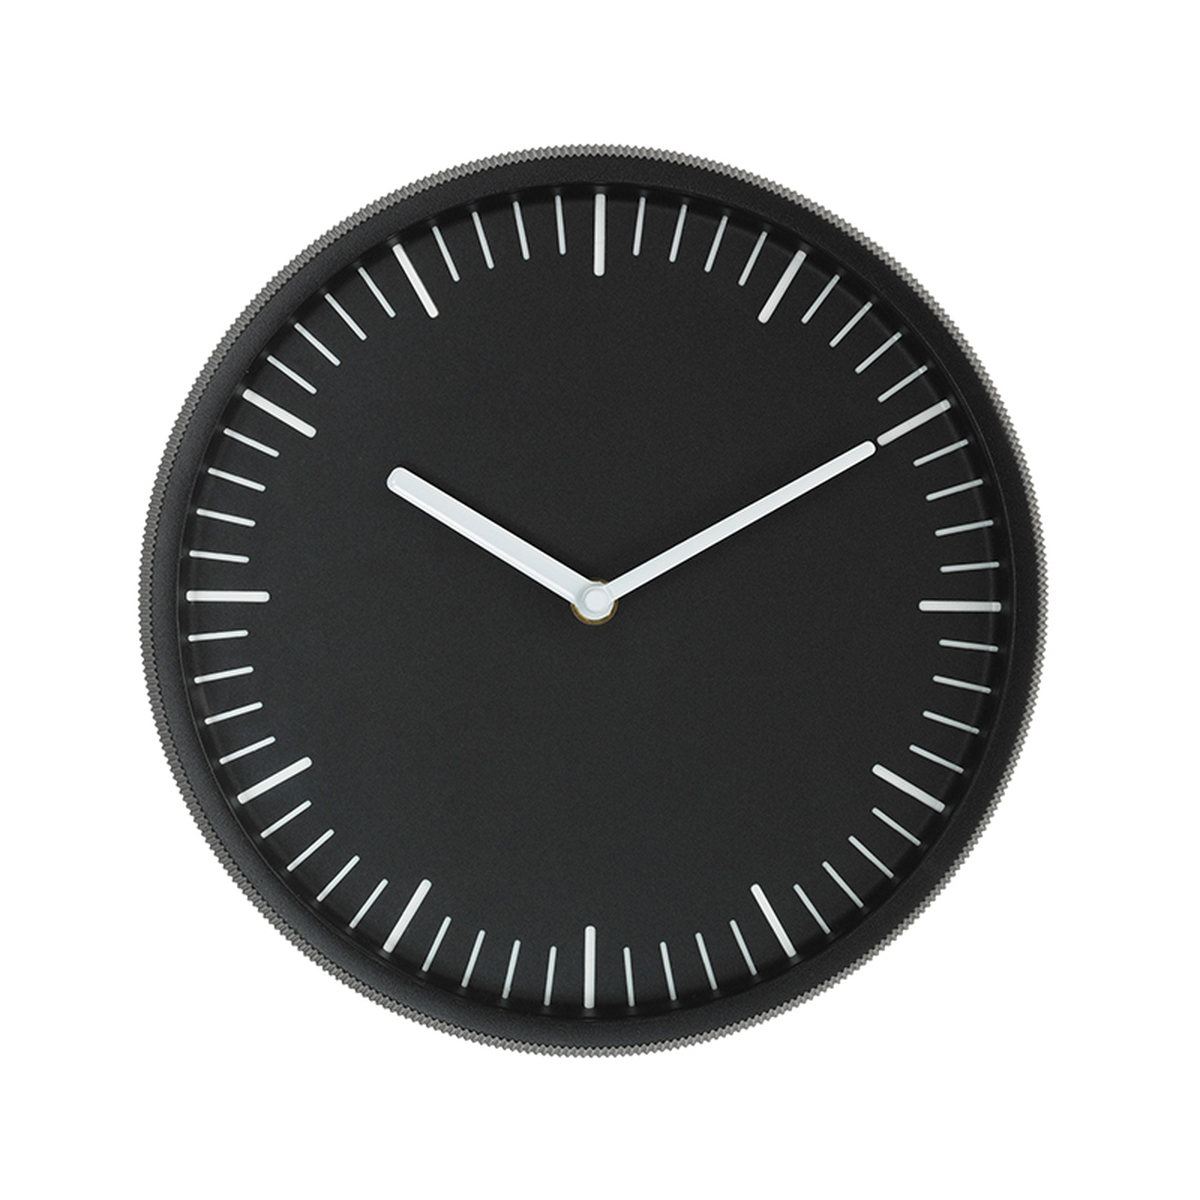 Normann copenhagen day wall clock black finnish design shop amipublicfo Images